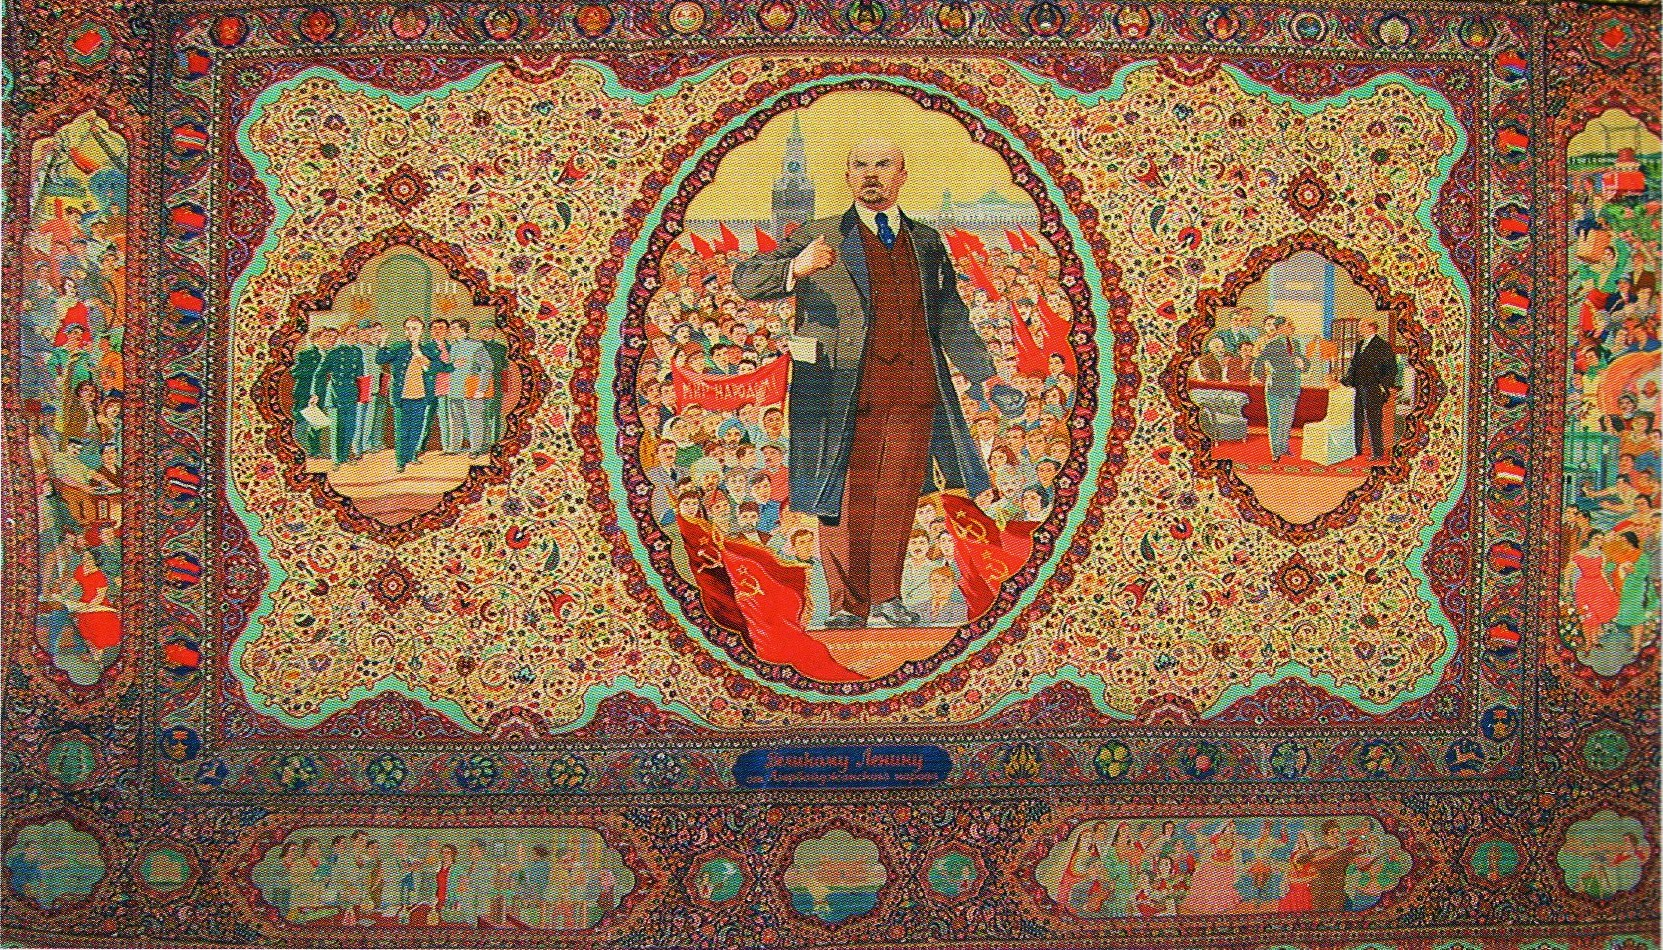 Azerbaijani carpet LENIN Latif Kerimov.jpg